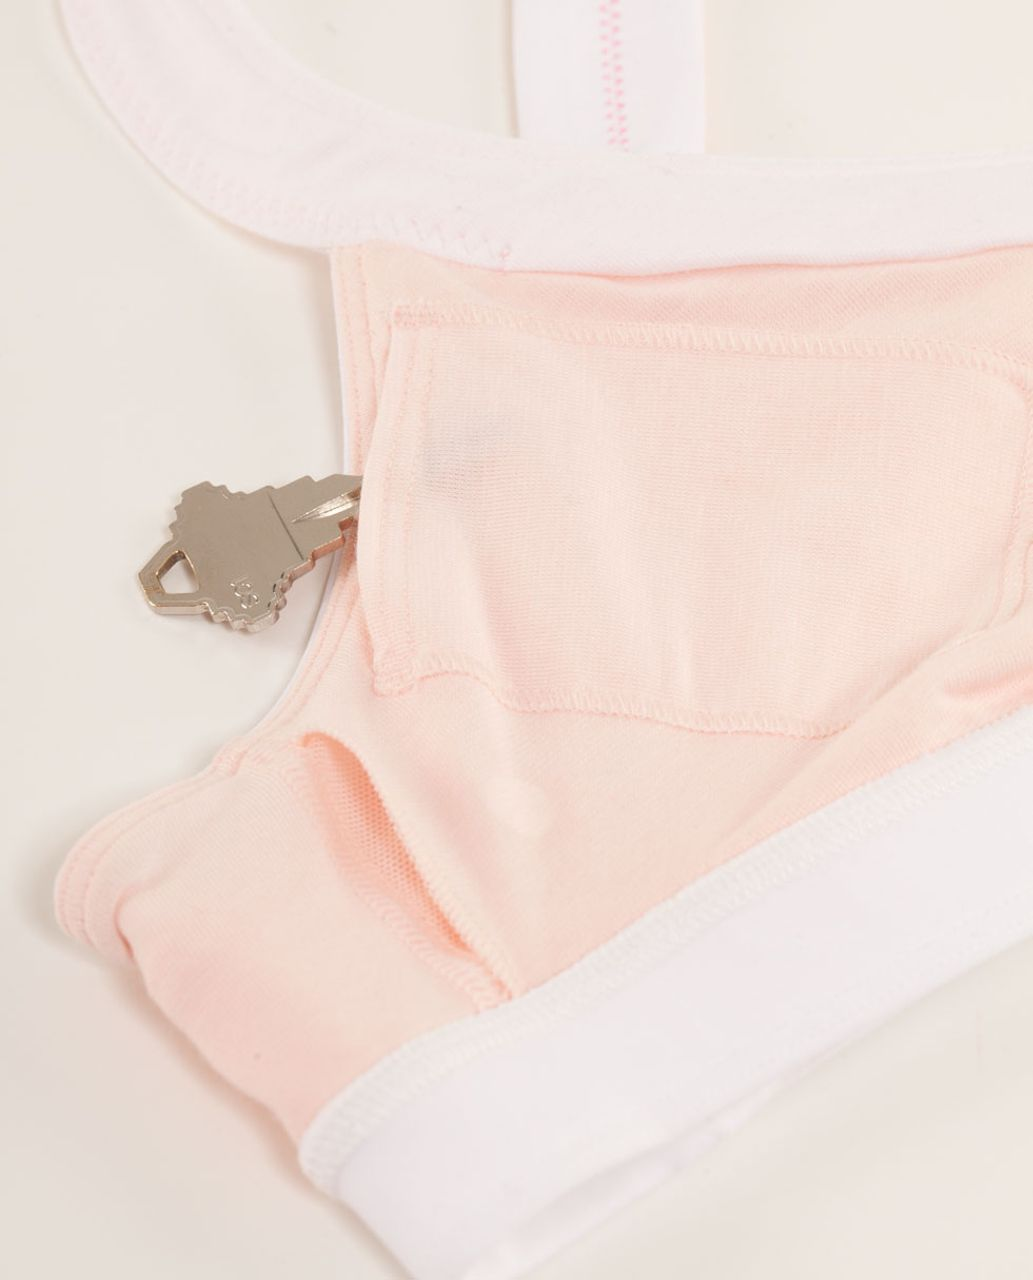 Lululemon Run:  Sprint Bra - Parfait Pink / White